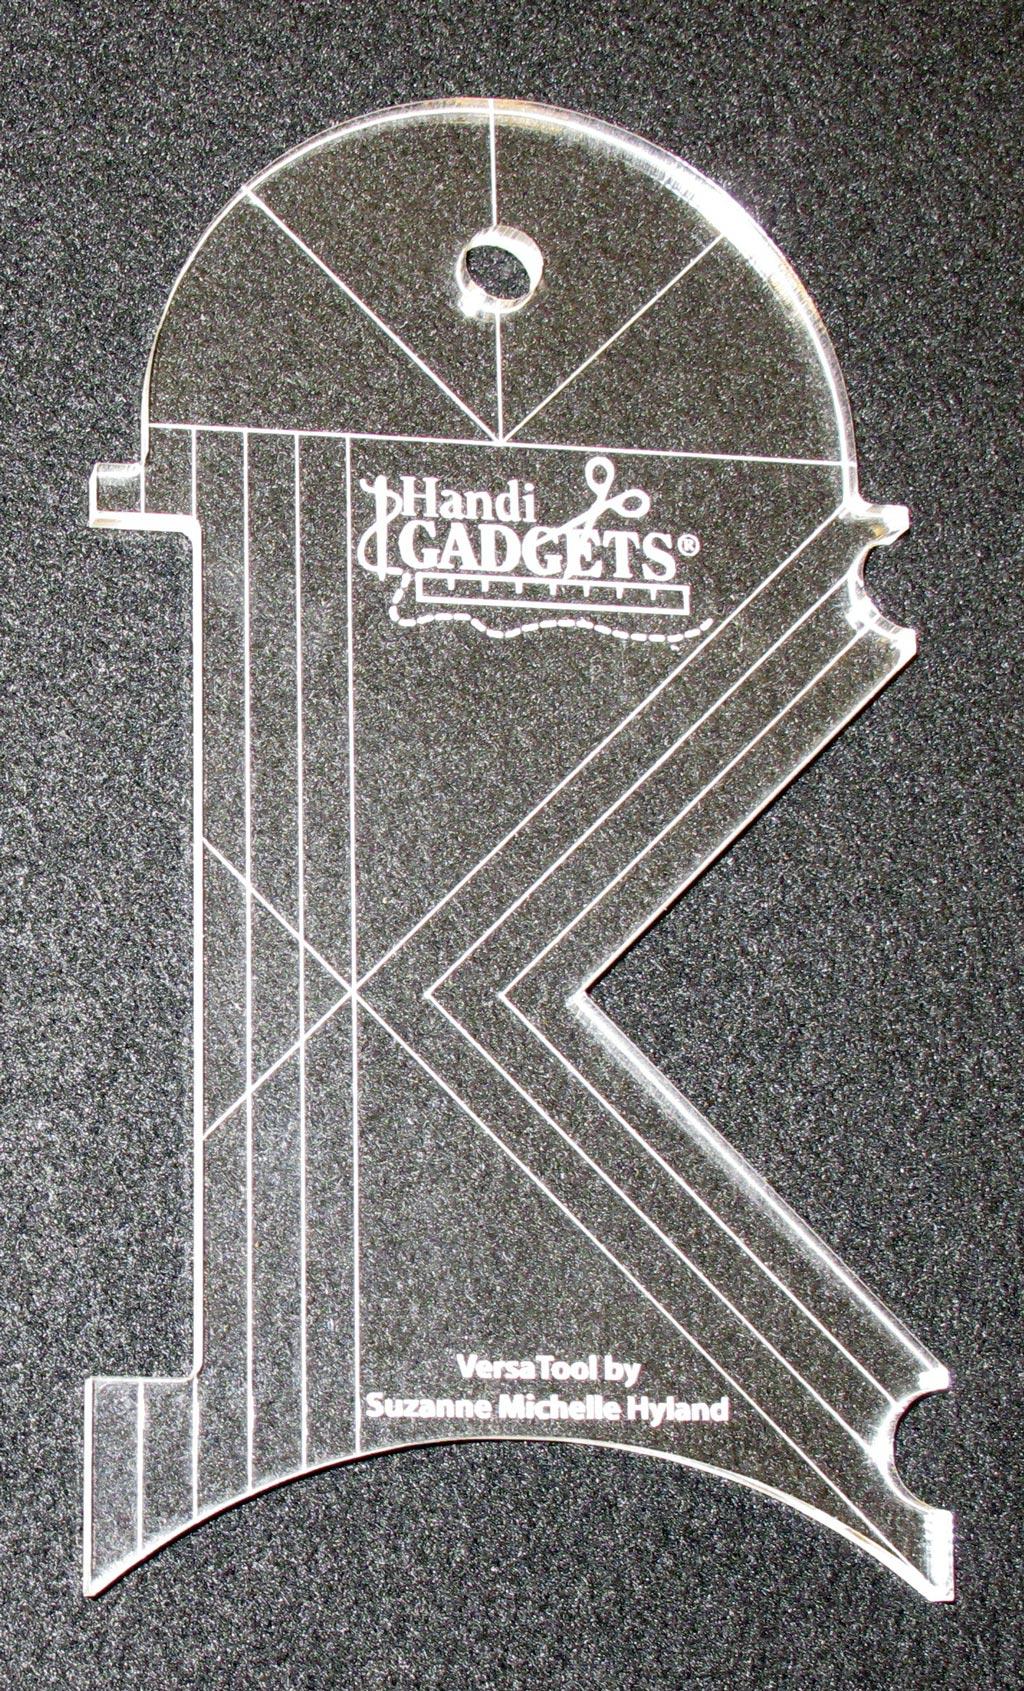 Handi Quilter VersaTool For Machine Quilting : handi gadgets quilting - Adamdwight.com